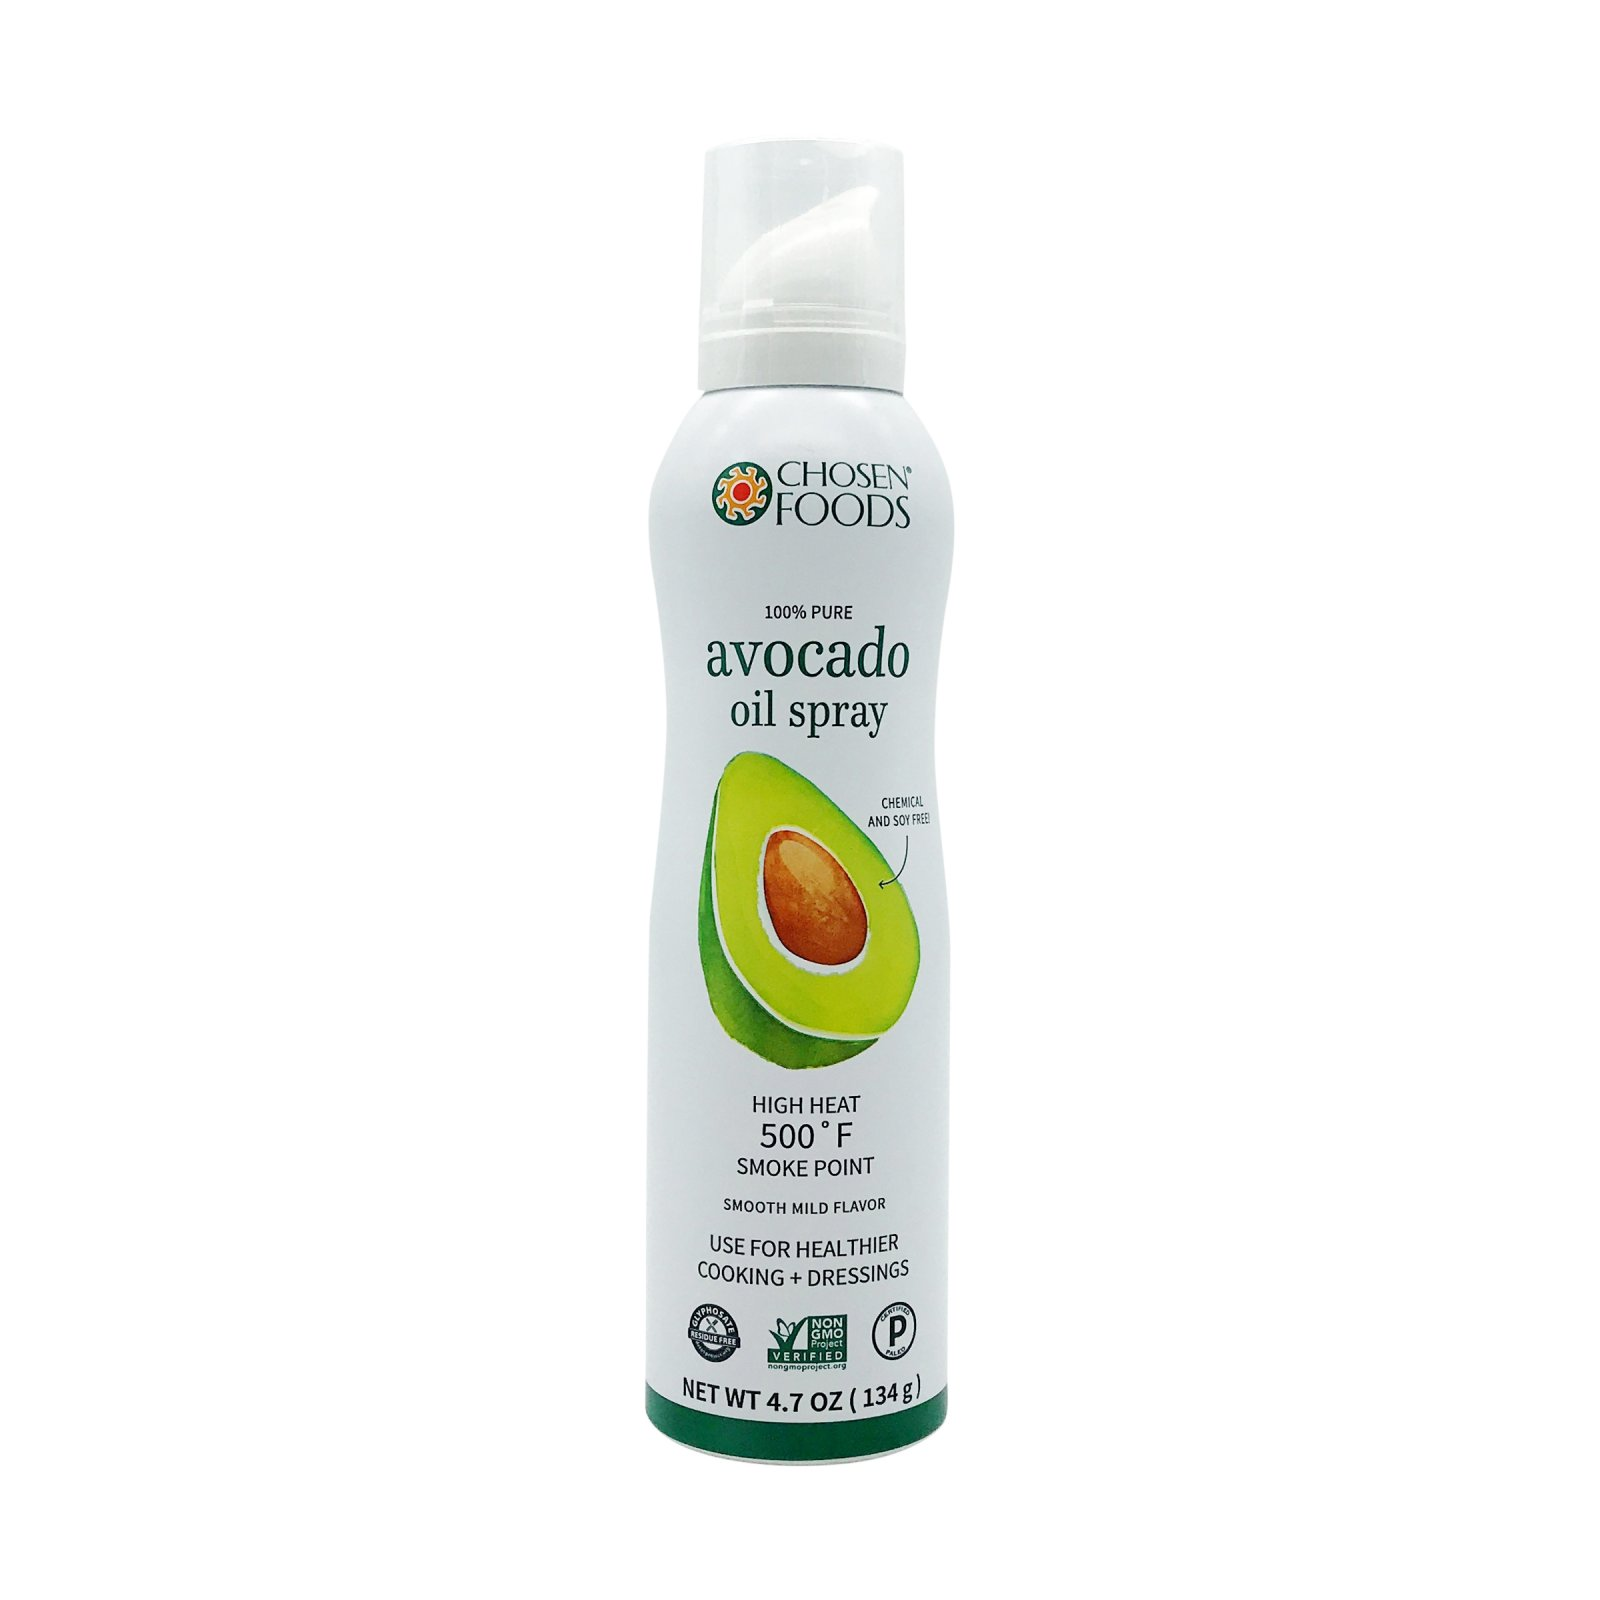 Avocado Oil Spray 4.7 Ounce